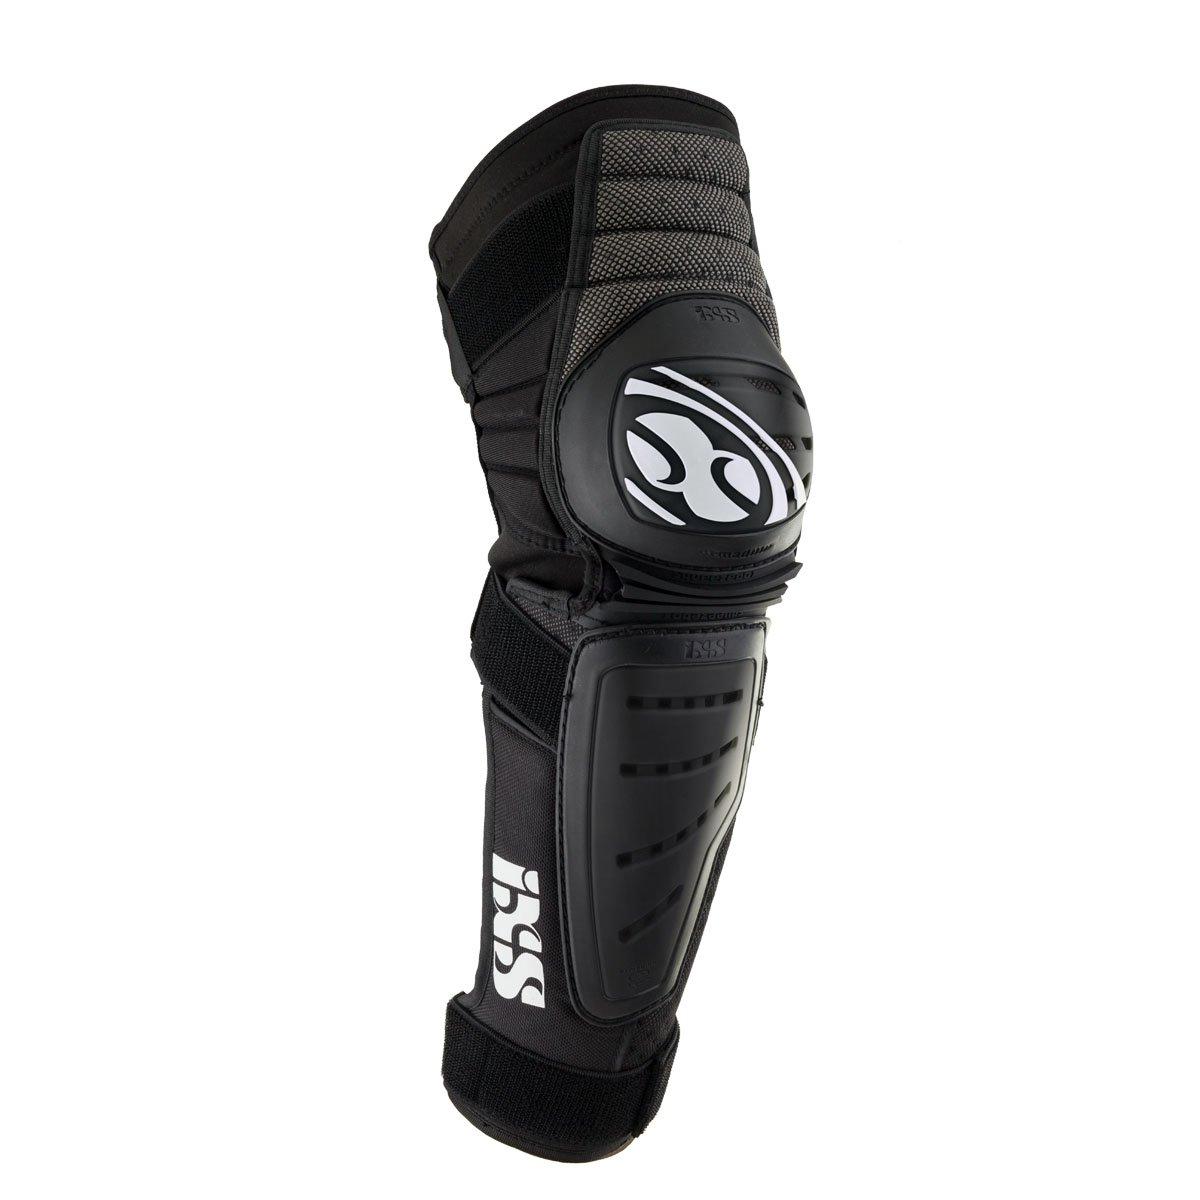 IXS Cleaver Knee/Shin Guards black (Size: XL) leg protector